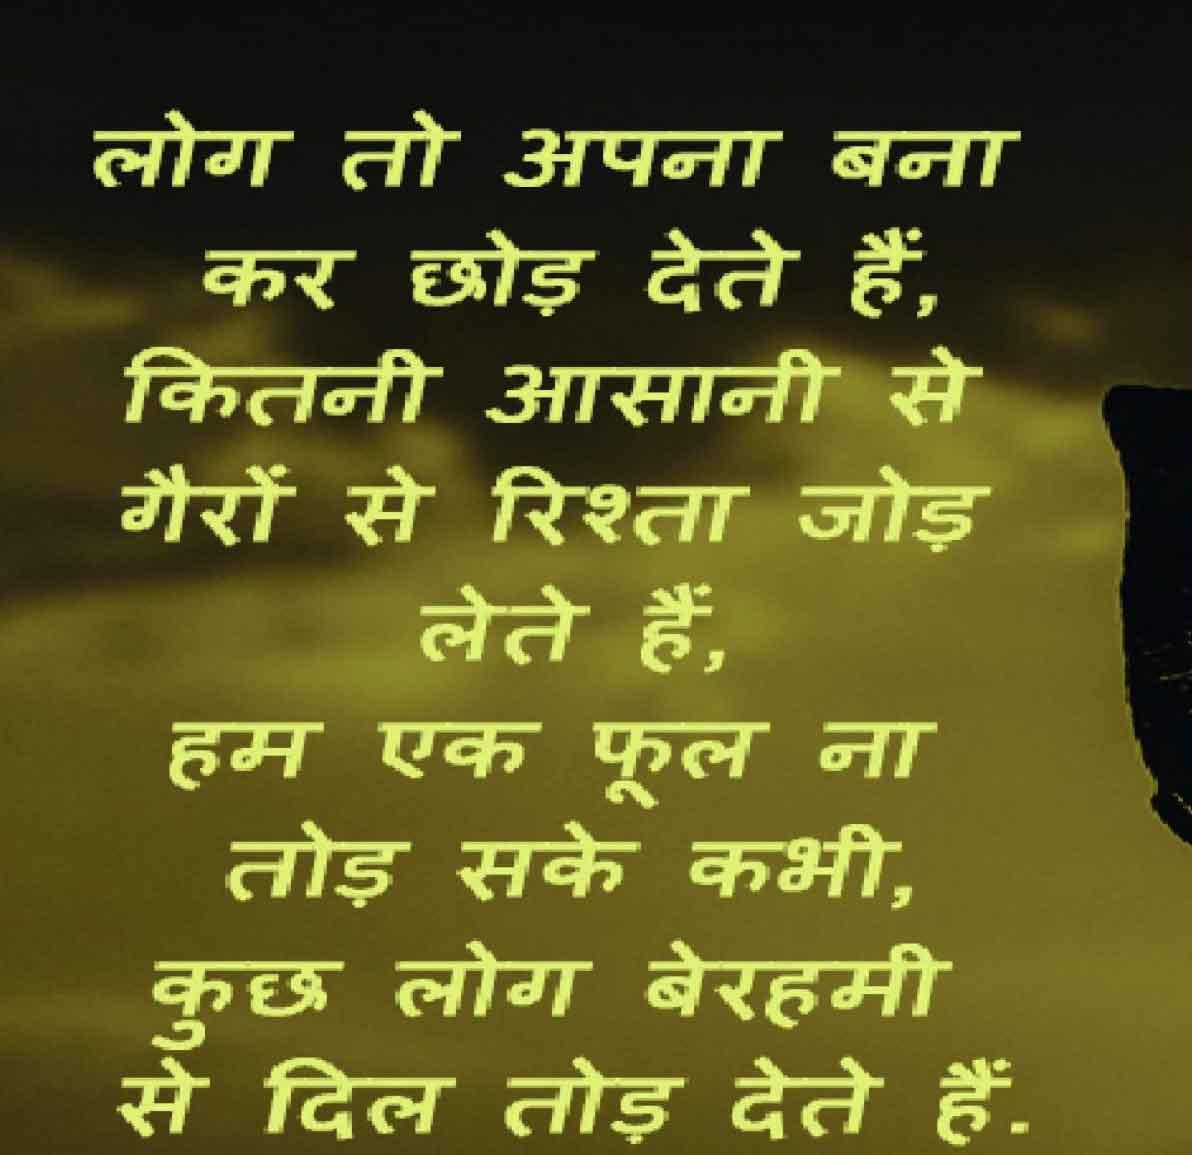 Hindi sad girl wallpaper hd